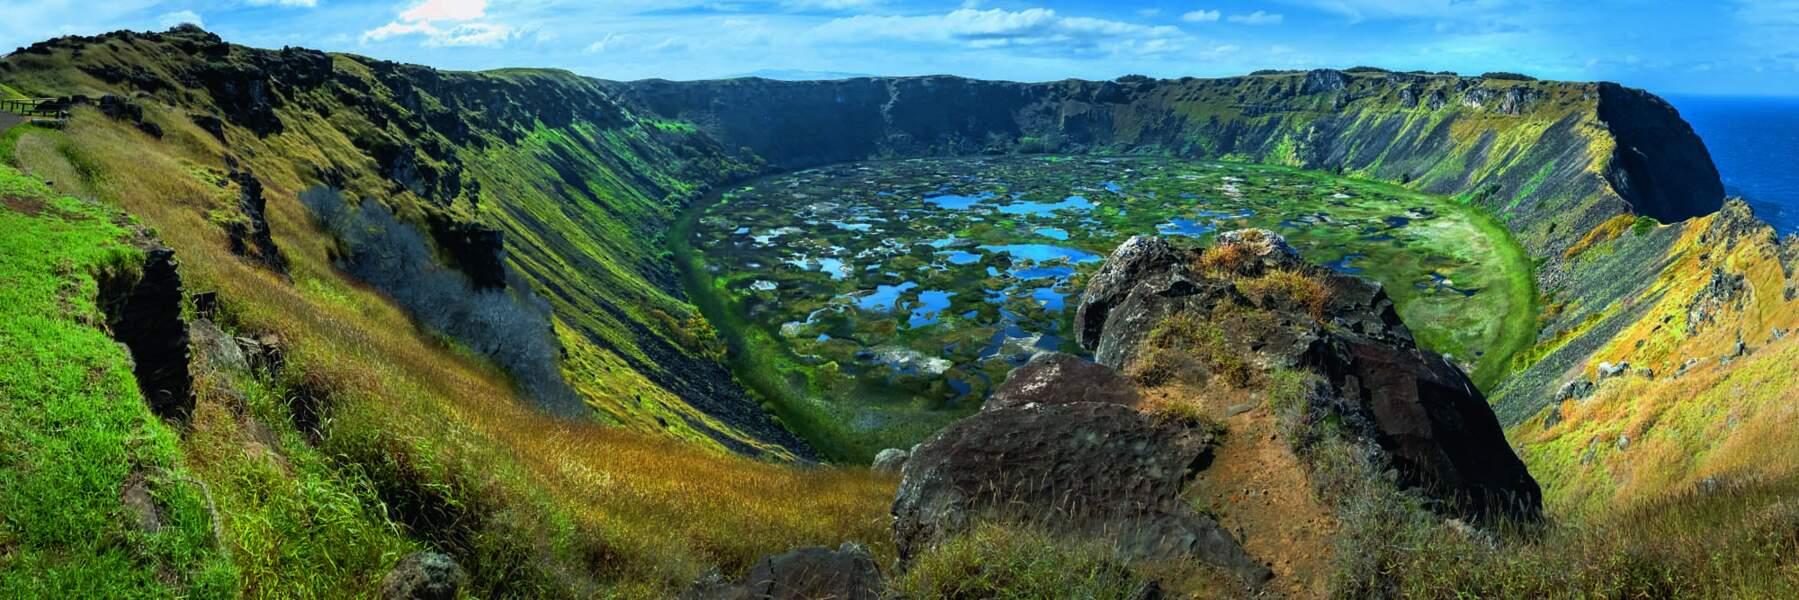 Le volcan Rano Kau